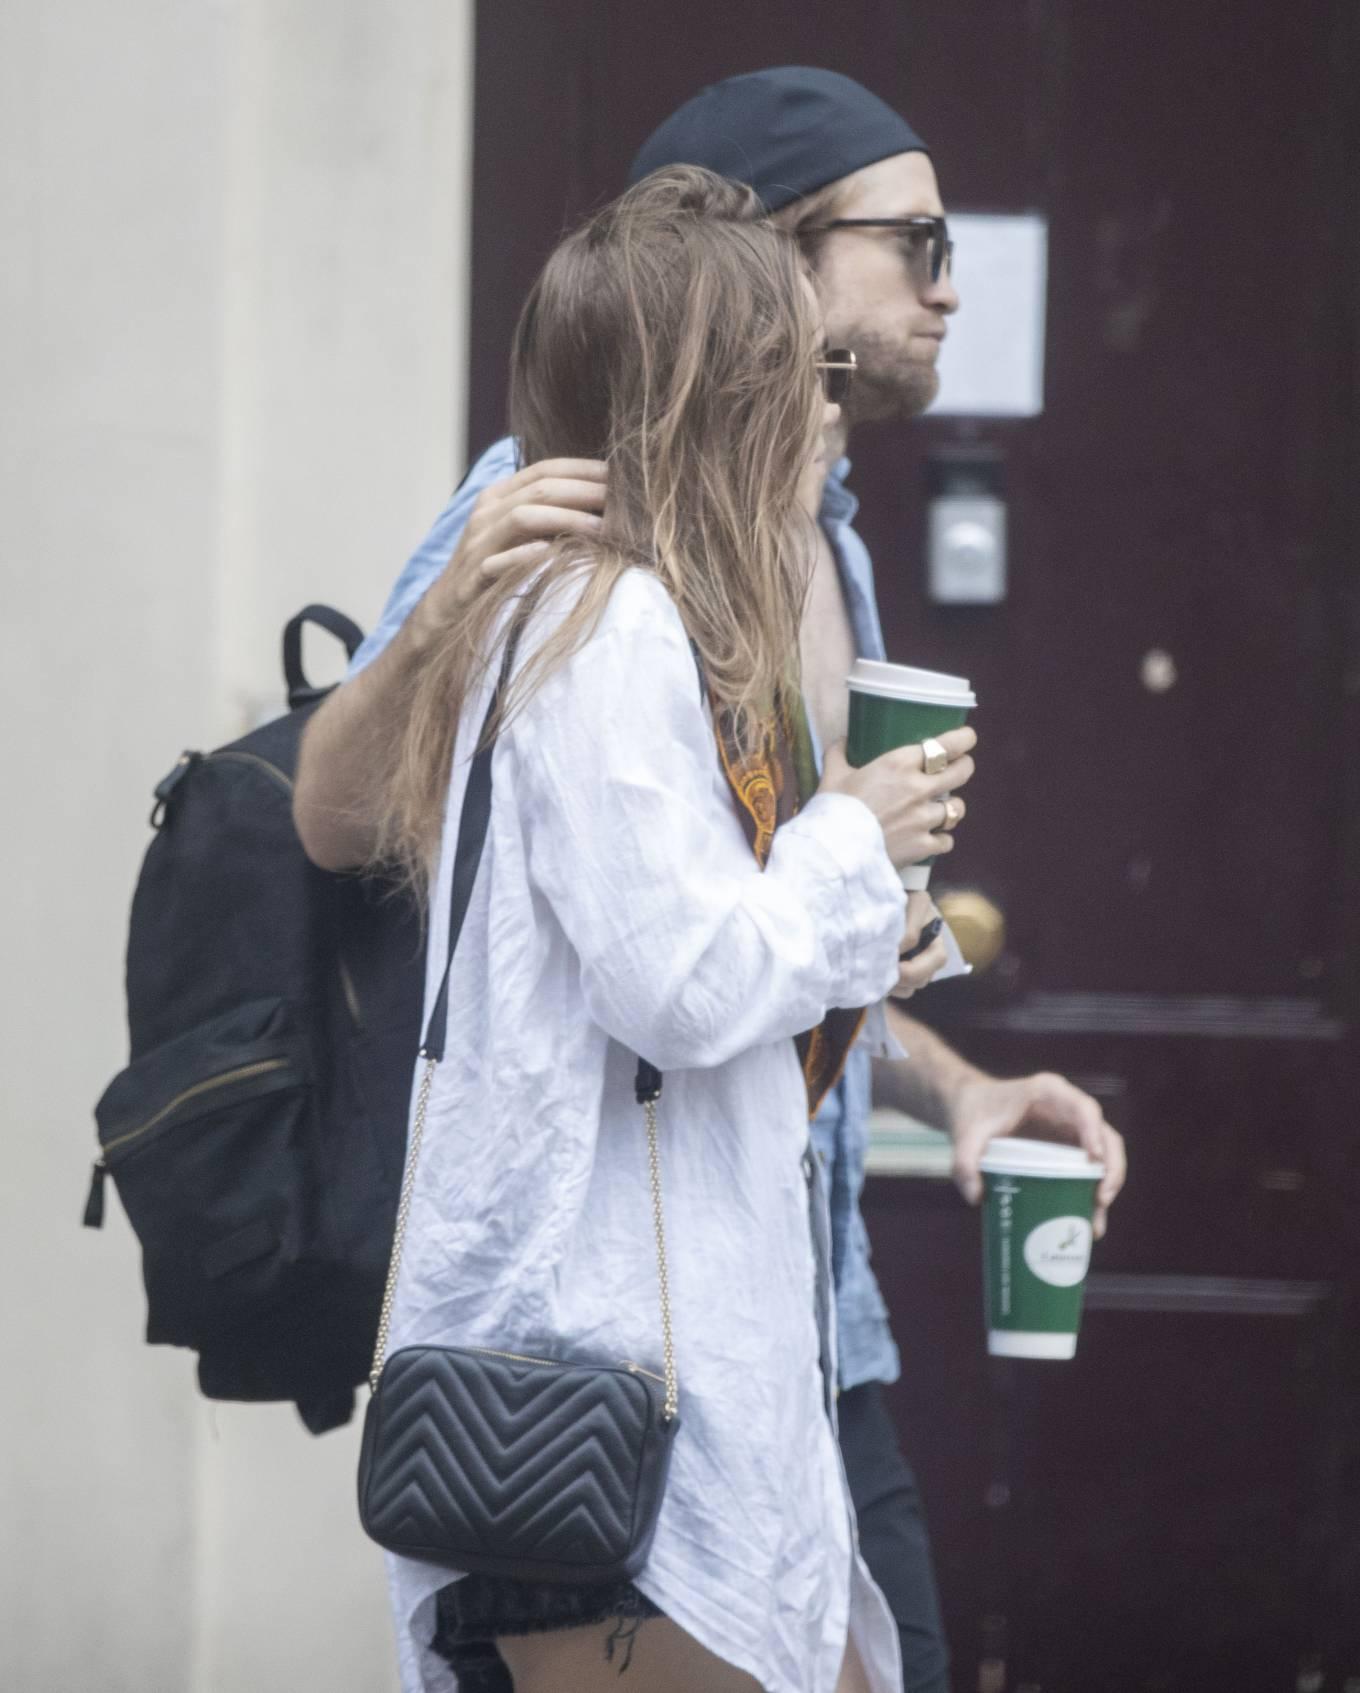 Suki Waterhouse 2020 : Suki Waterhouse and Robert Pattinson – Out in London-18